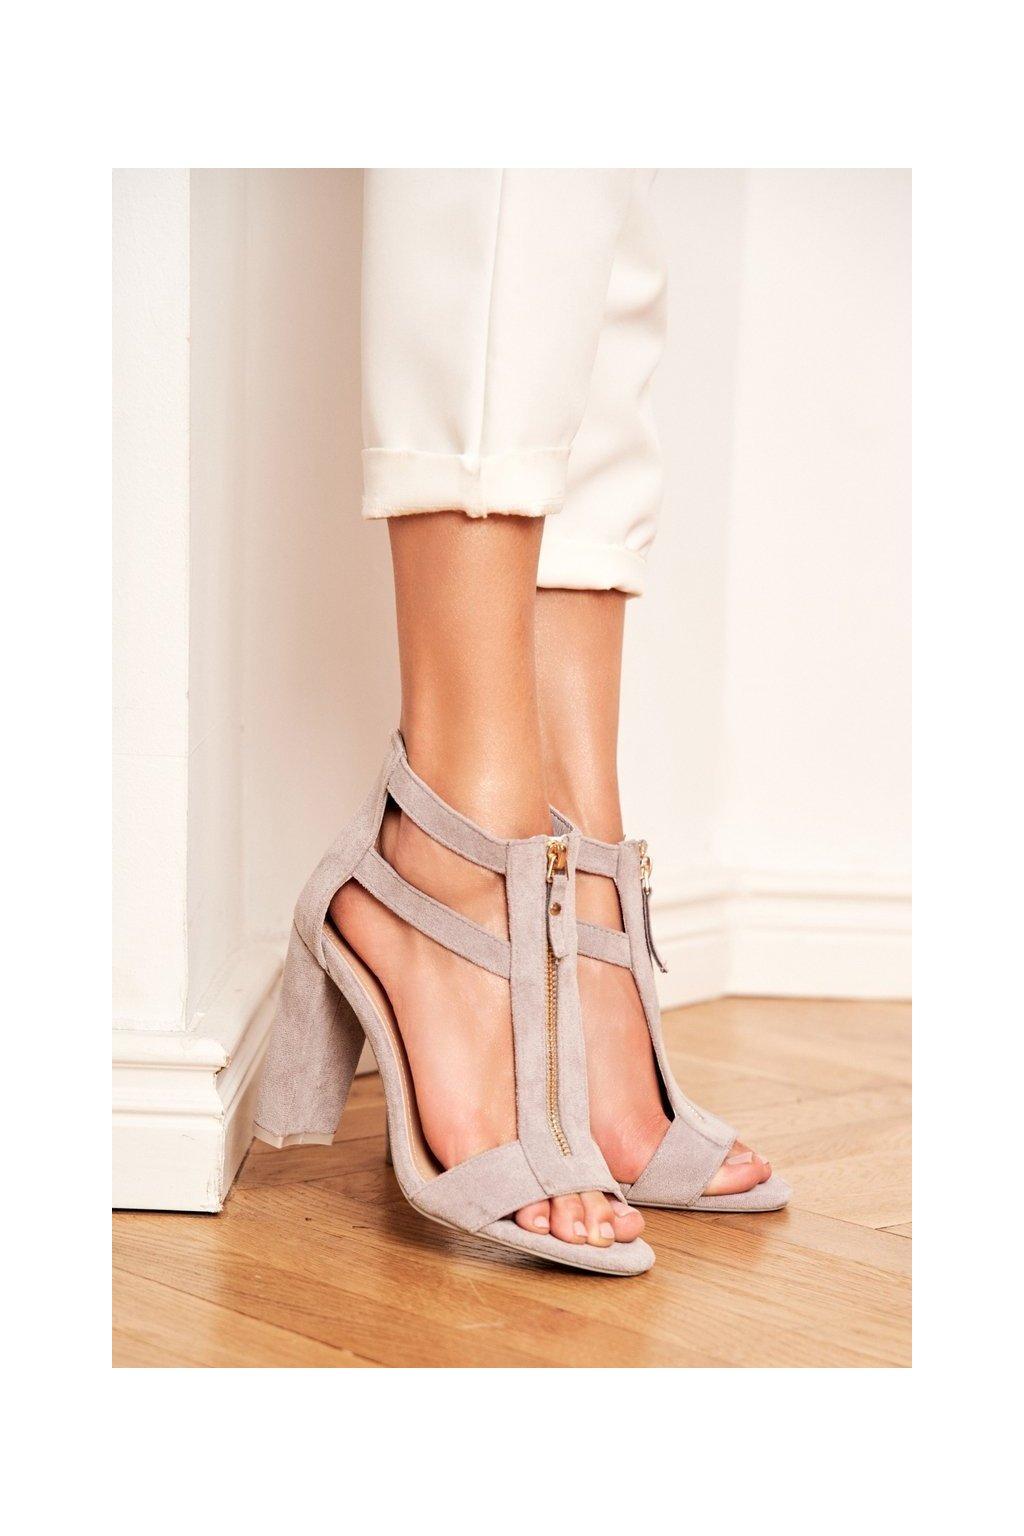 Dámske sandále na podpätku farba sivá kód obuvi LE070P GREY